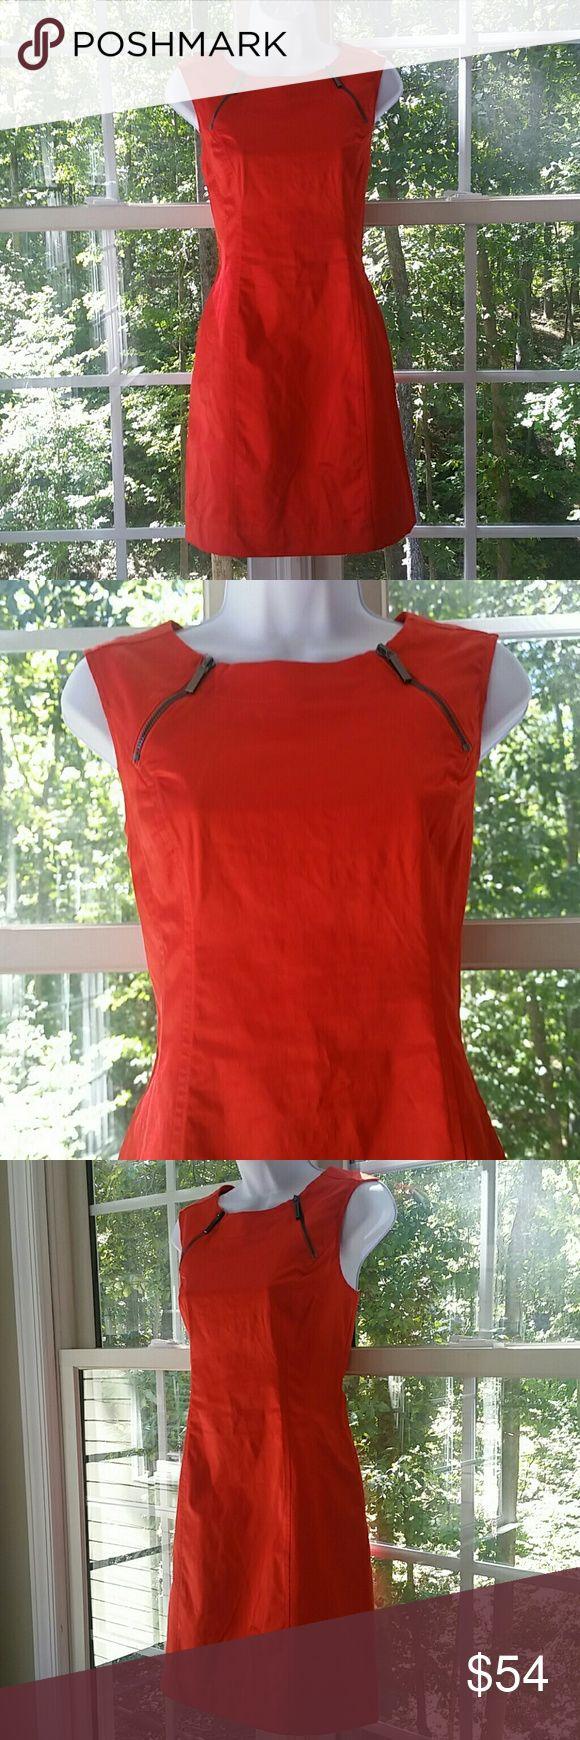 🆕Calvin Klein Bad @ss Zipper Burnt Orange Dress Measurements and colorful description to follow. Thank you for looking! Xoxoxoxo Calvin Klein Dresses